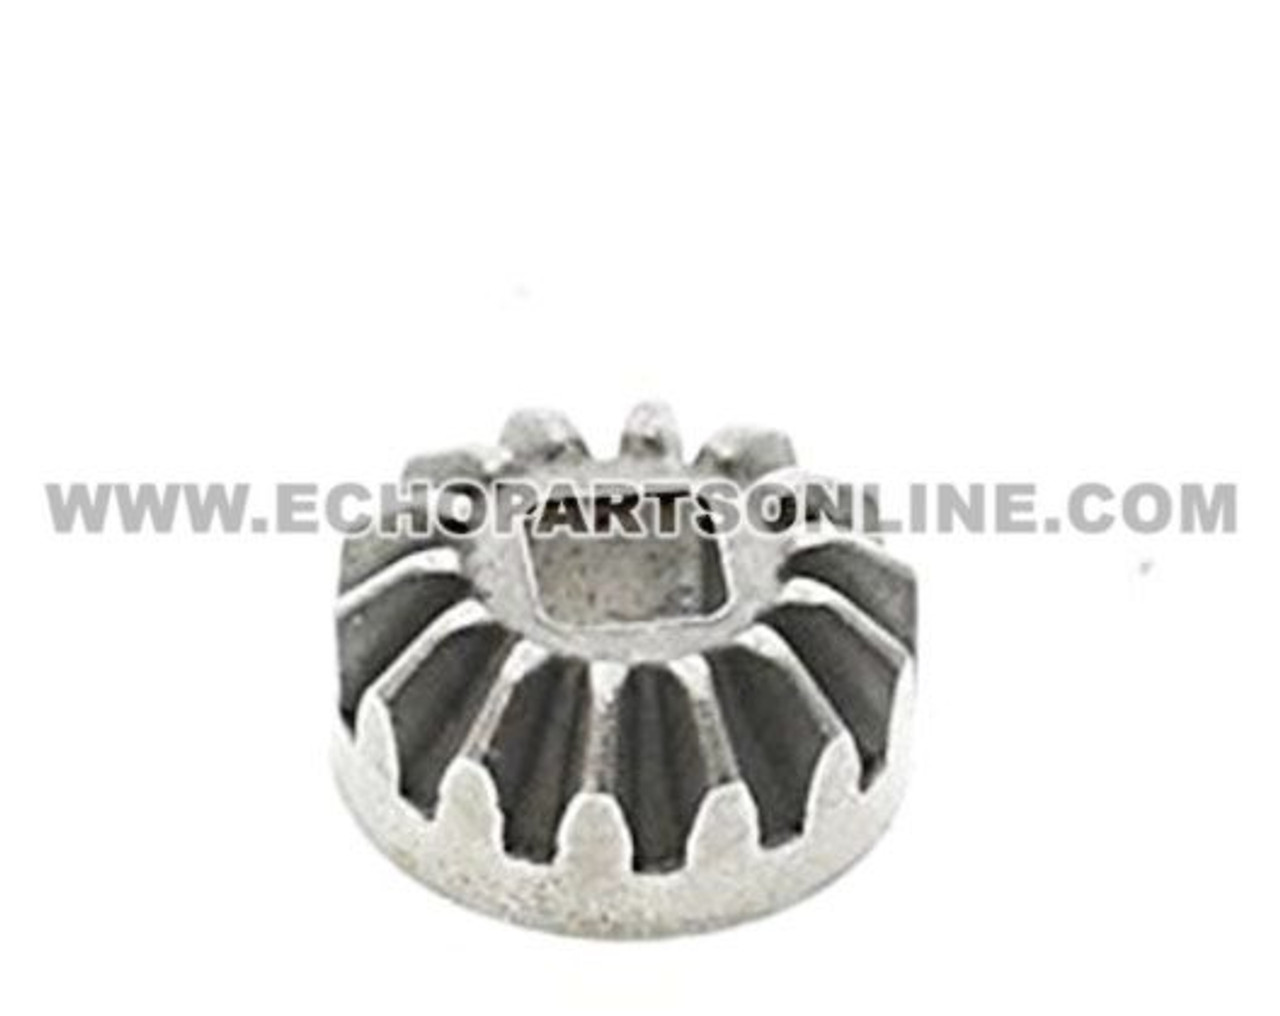 ECHO V651000011 - GEAR BEVEL - Image 1